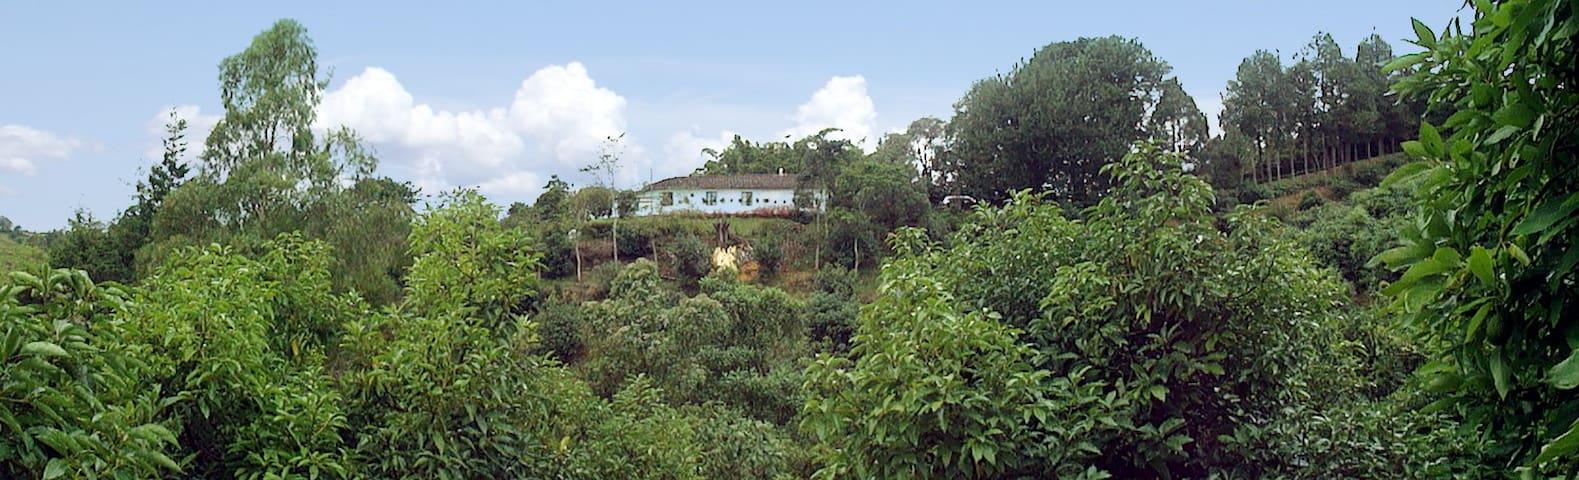 Acogedora Finca cerca a Rionegro Paz y Naturaleza